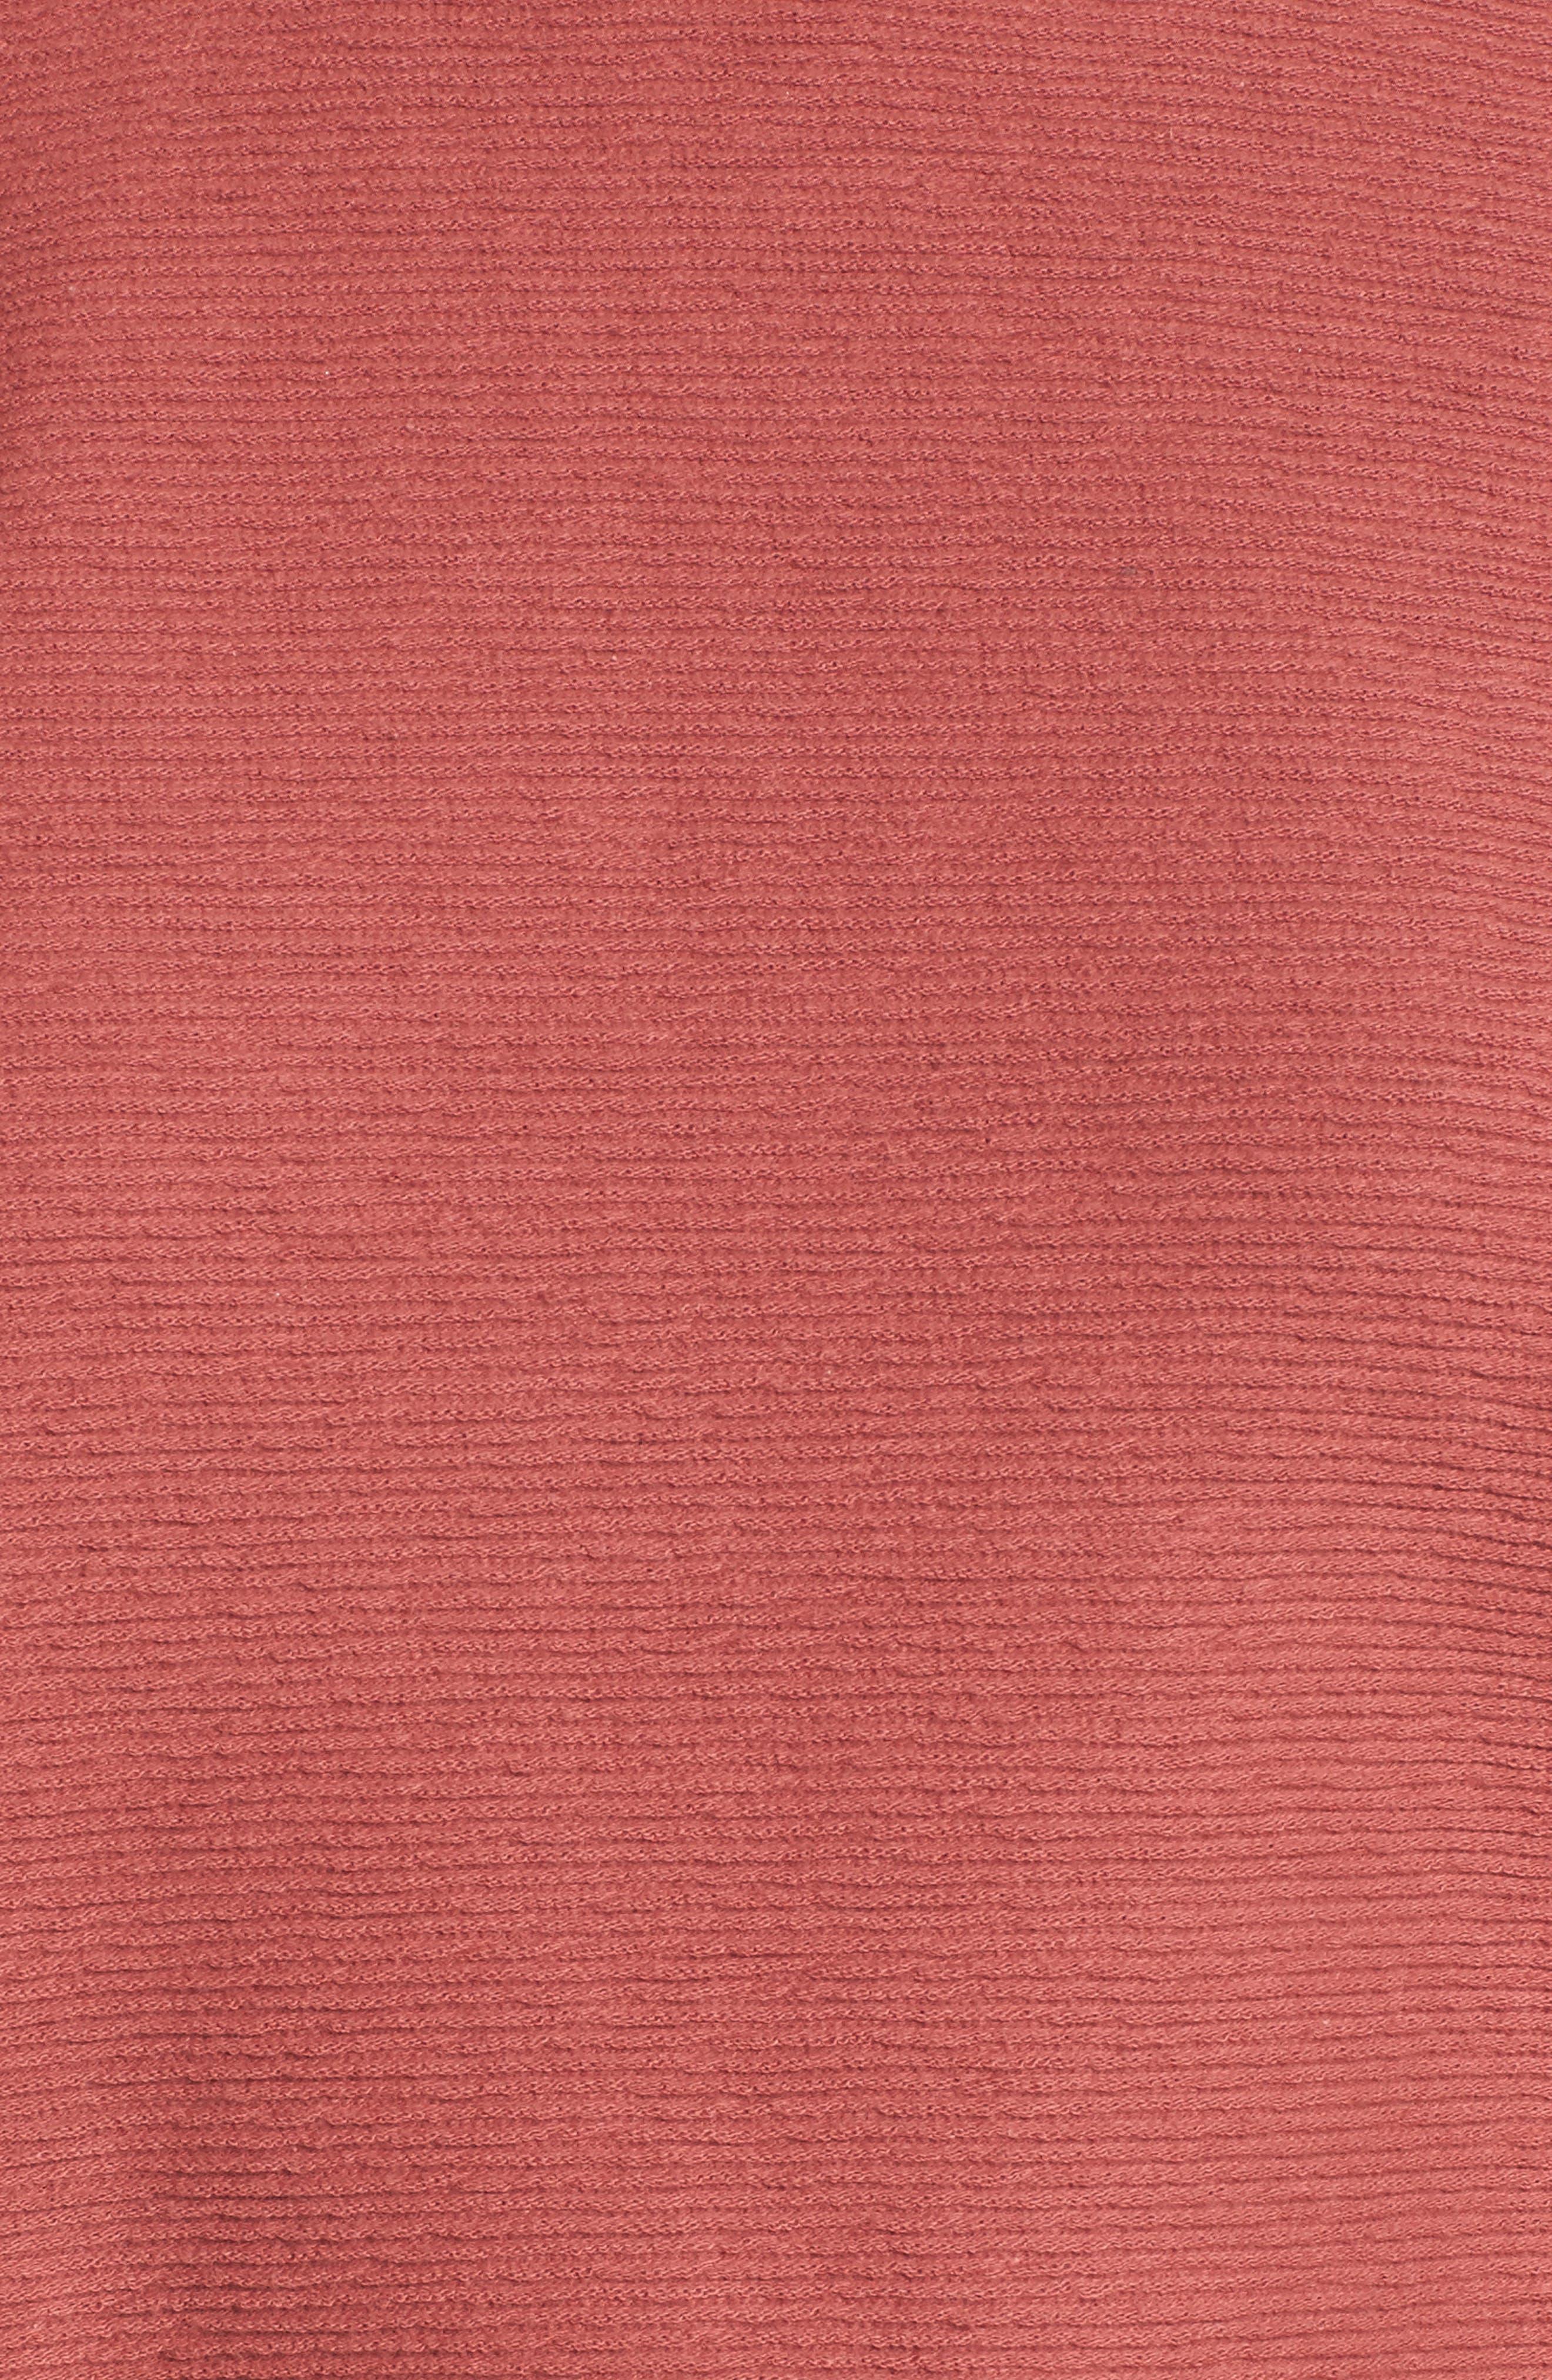 Alternate Image 5  - Madewell Flare Sleeve Ribbed Top